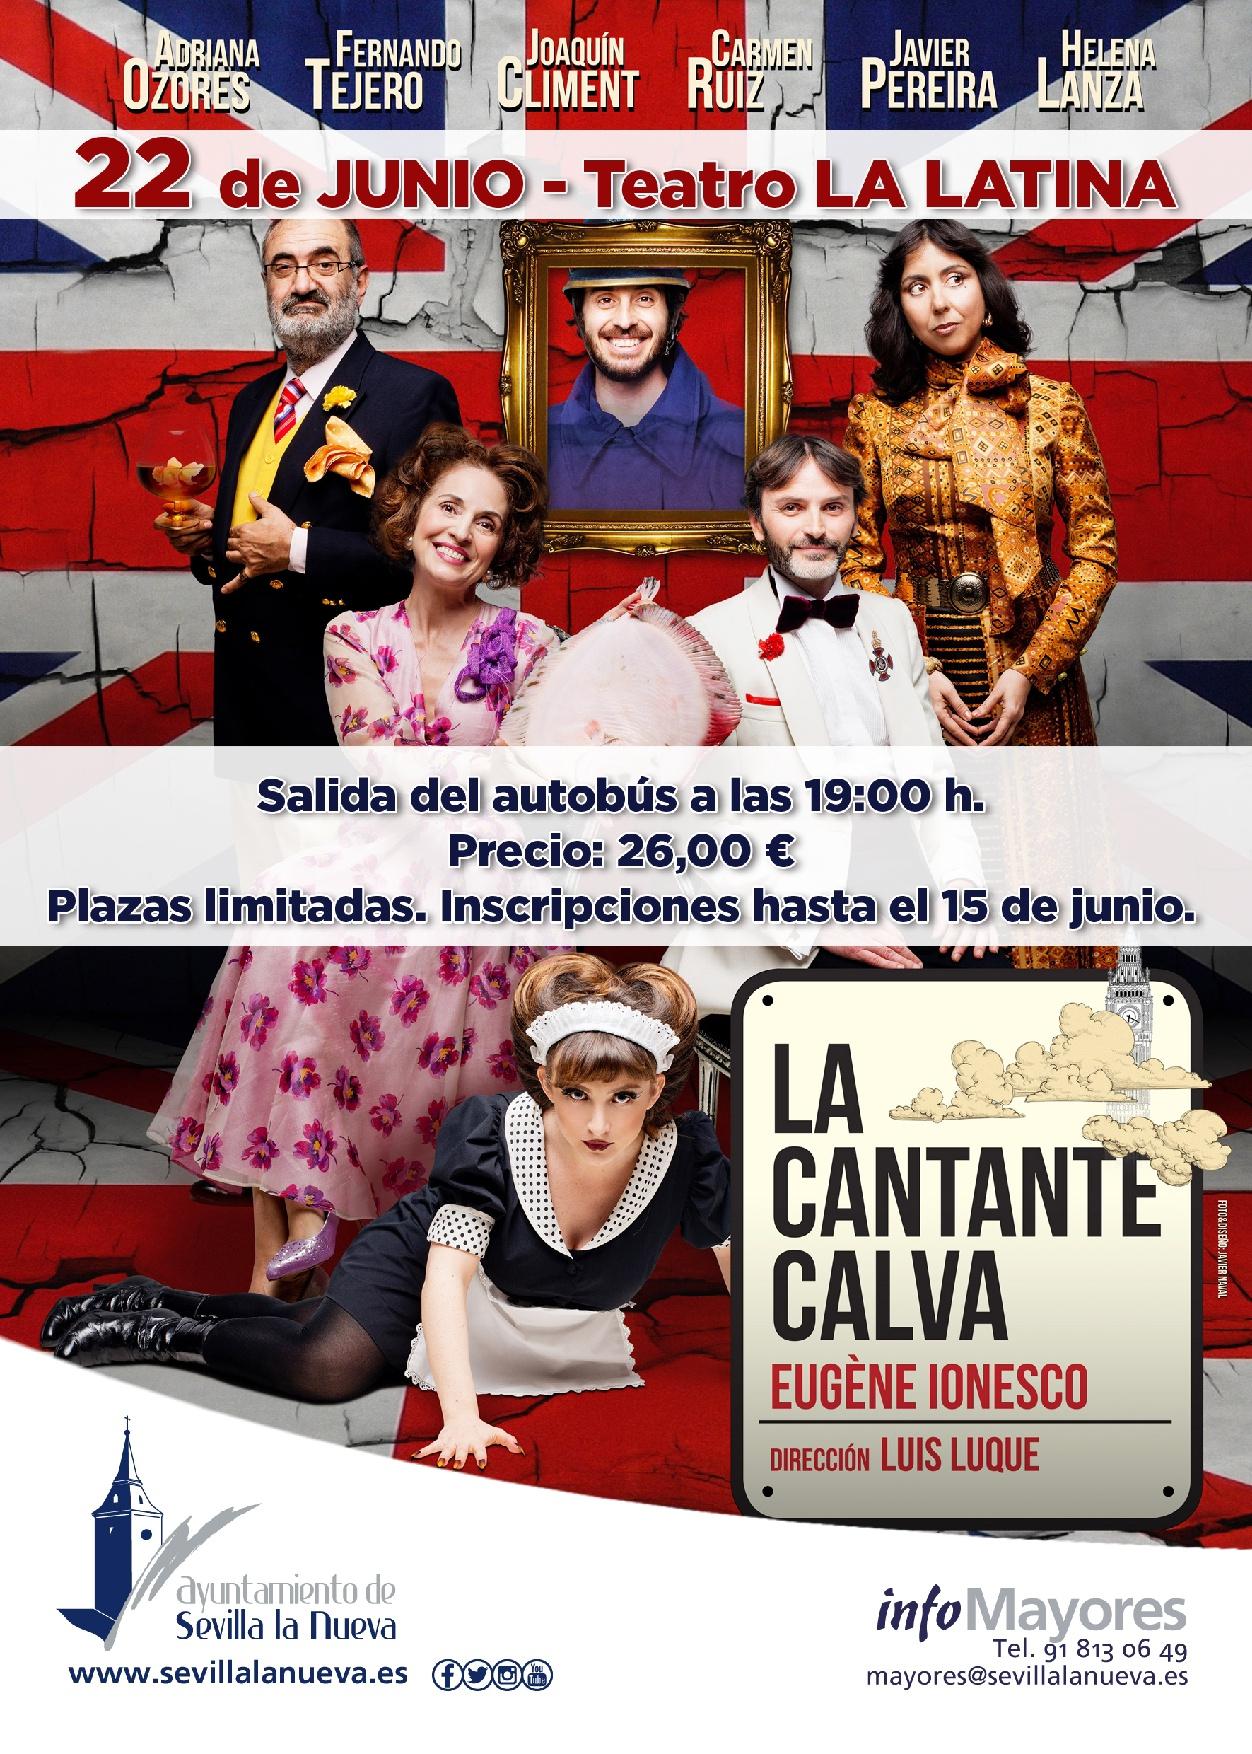 'La cantante calva' - Teatro La Latina @ Teatro La Latina